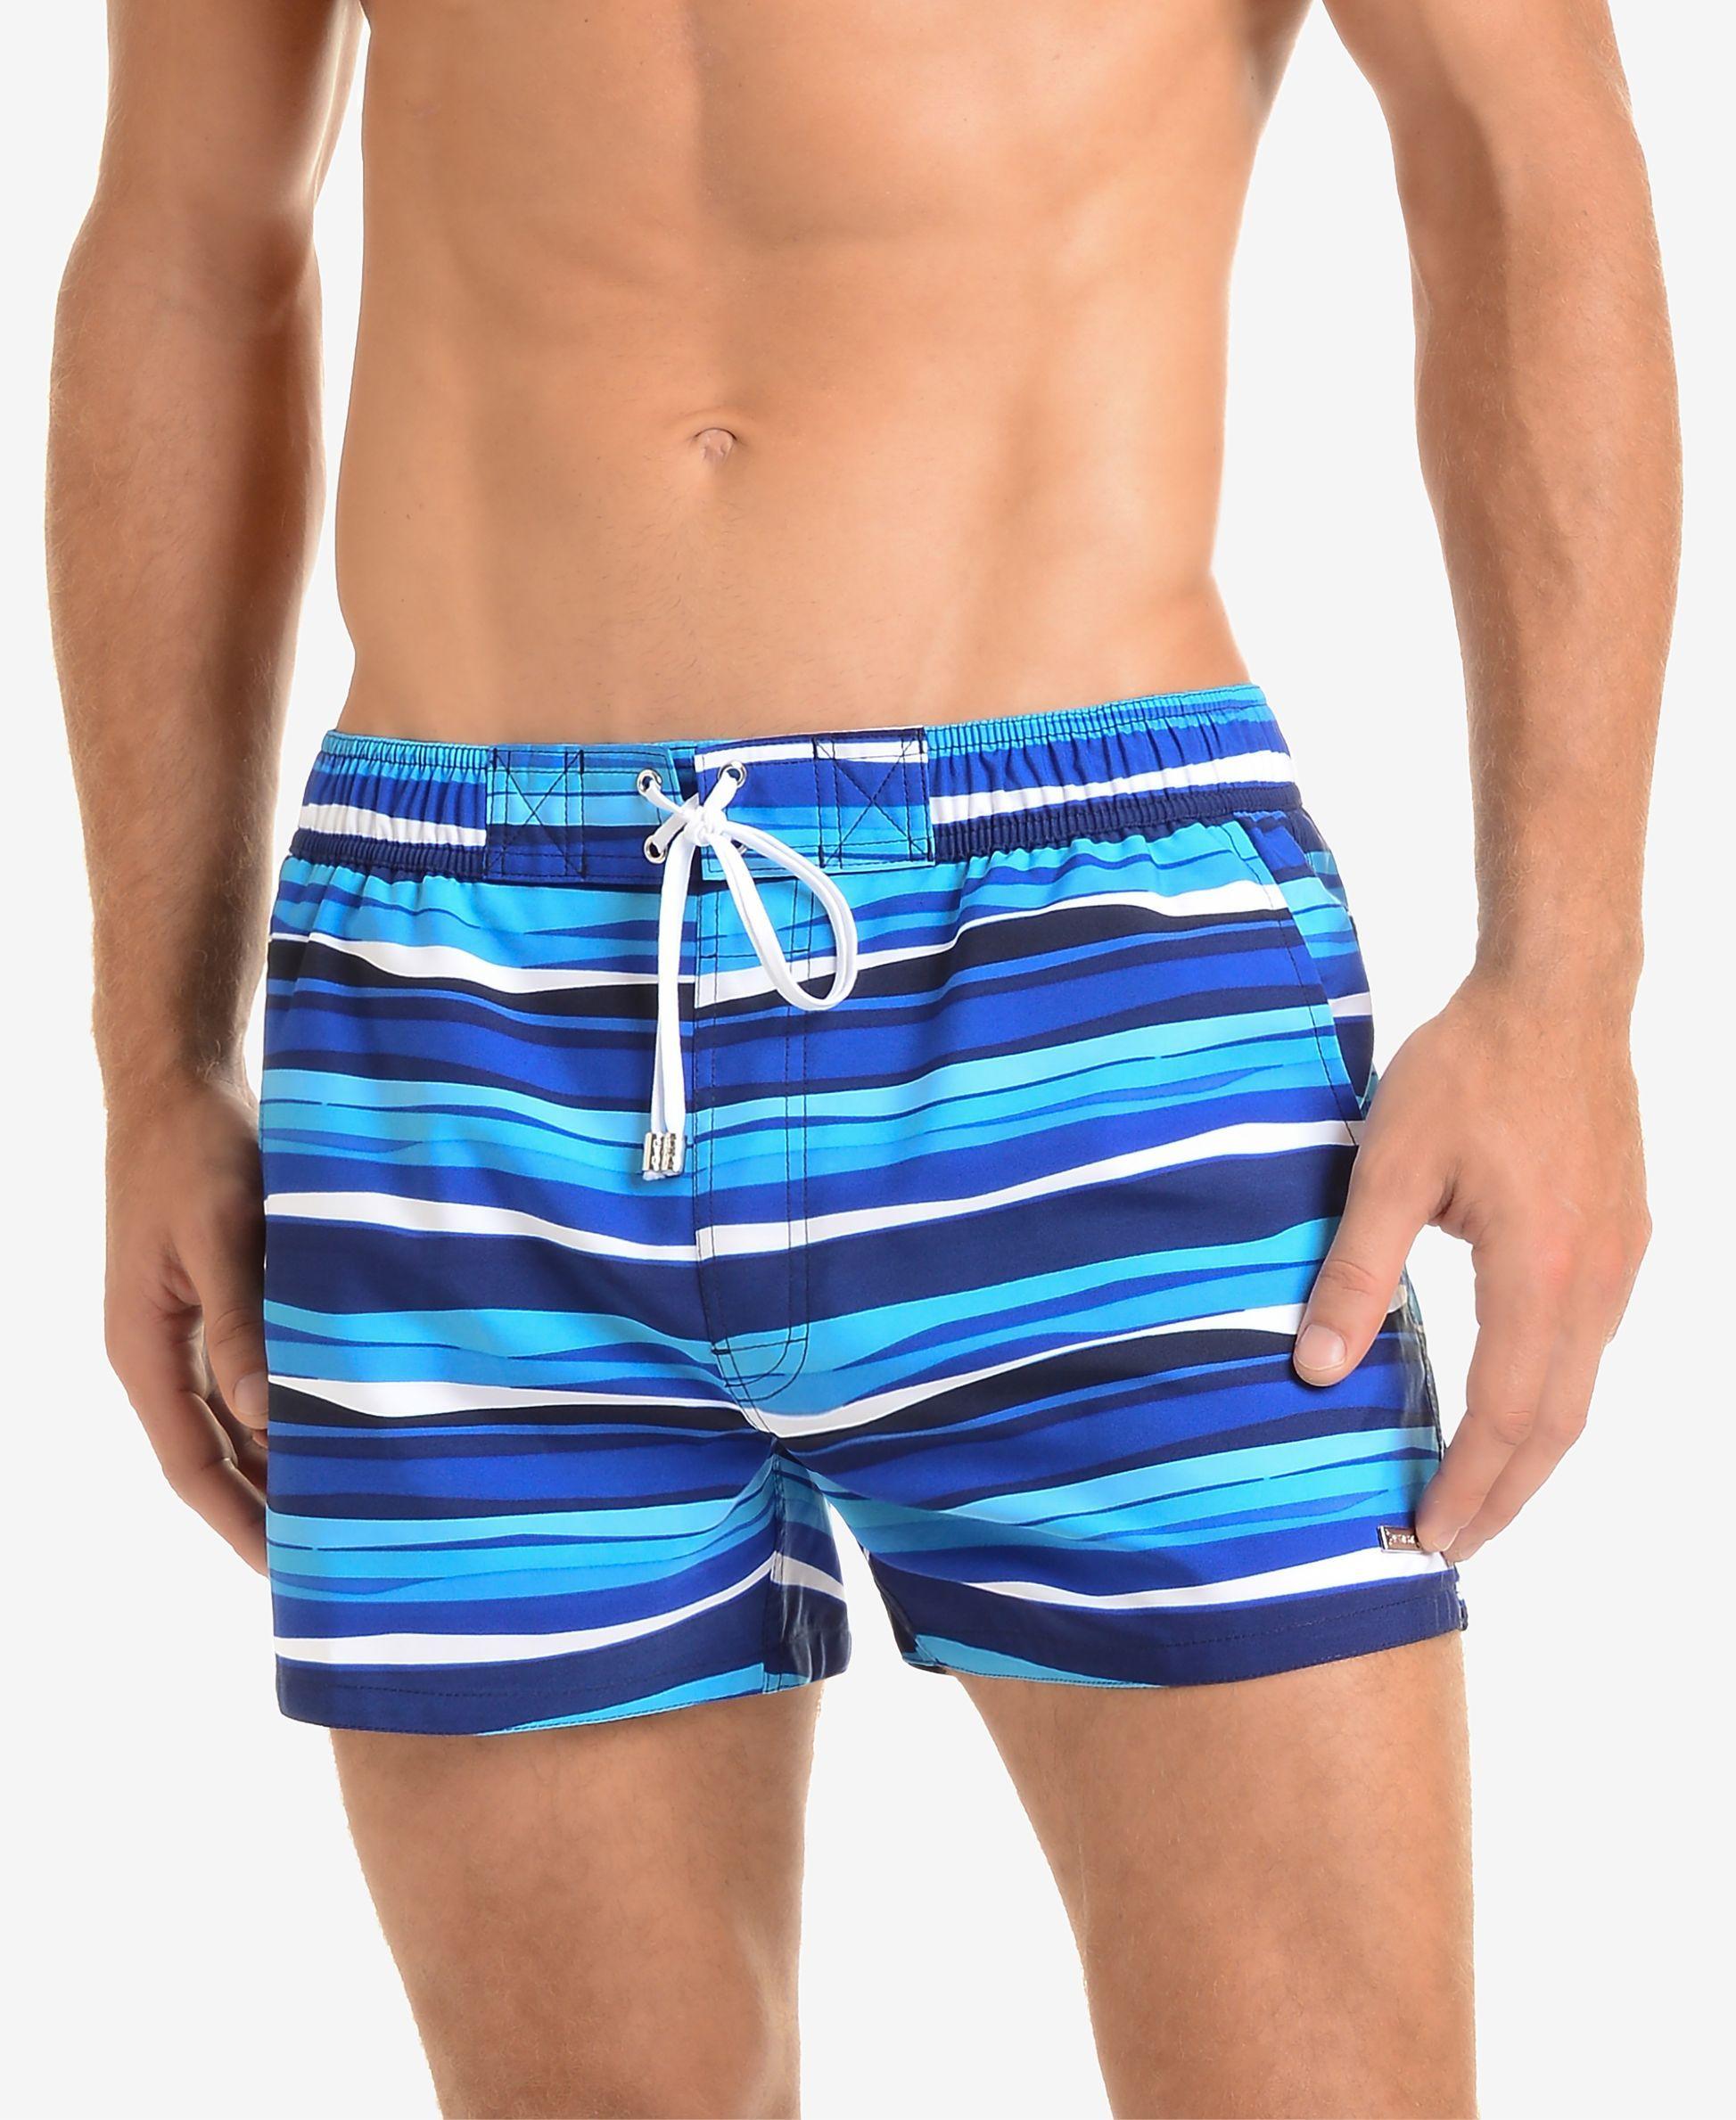 The Soul Men's Swimwear / Mens swim trunks / Mens shorts / Swimsuit / Ibiza style / Travel gifts / Swimwear Men as6zkH